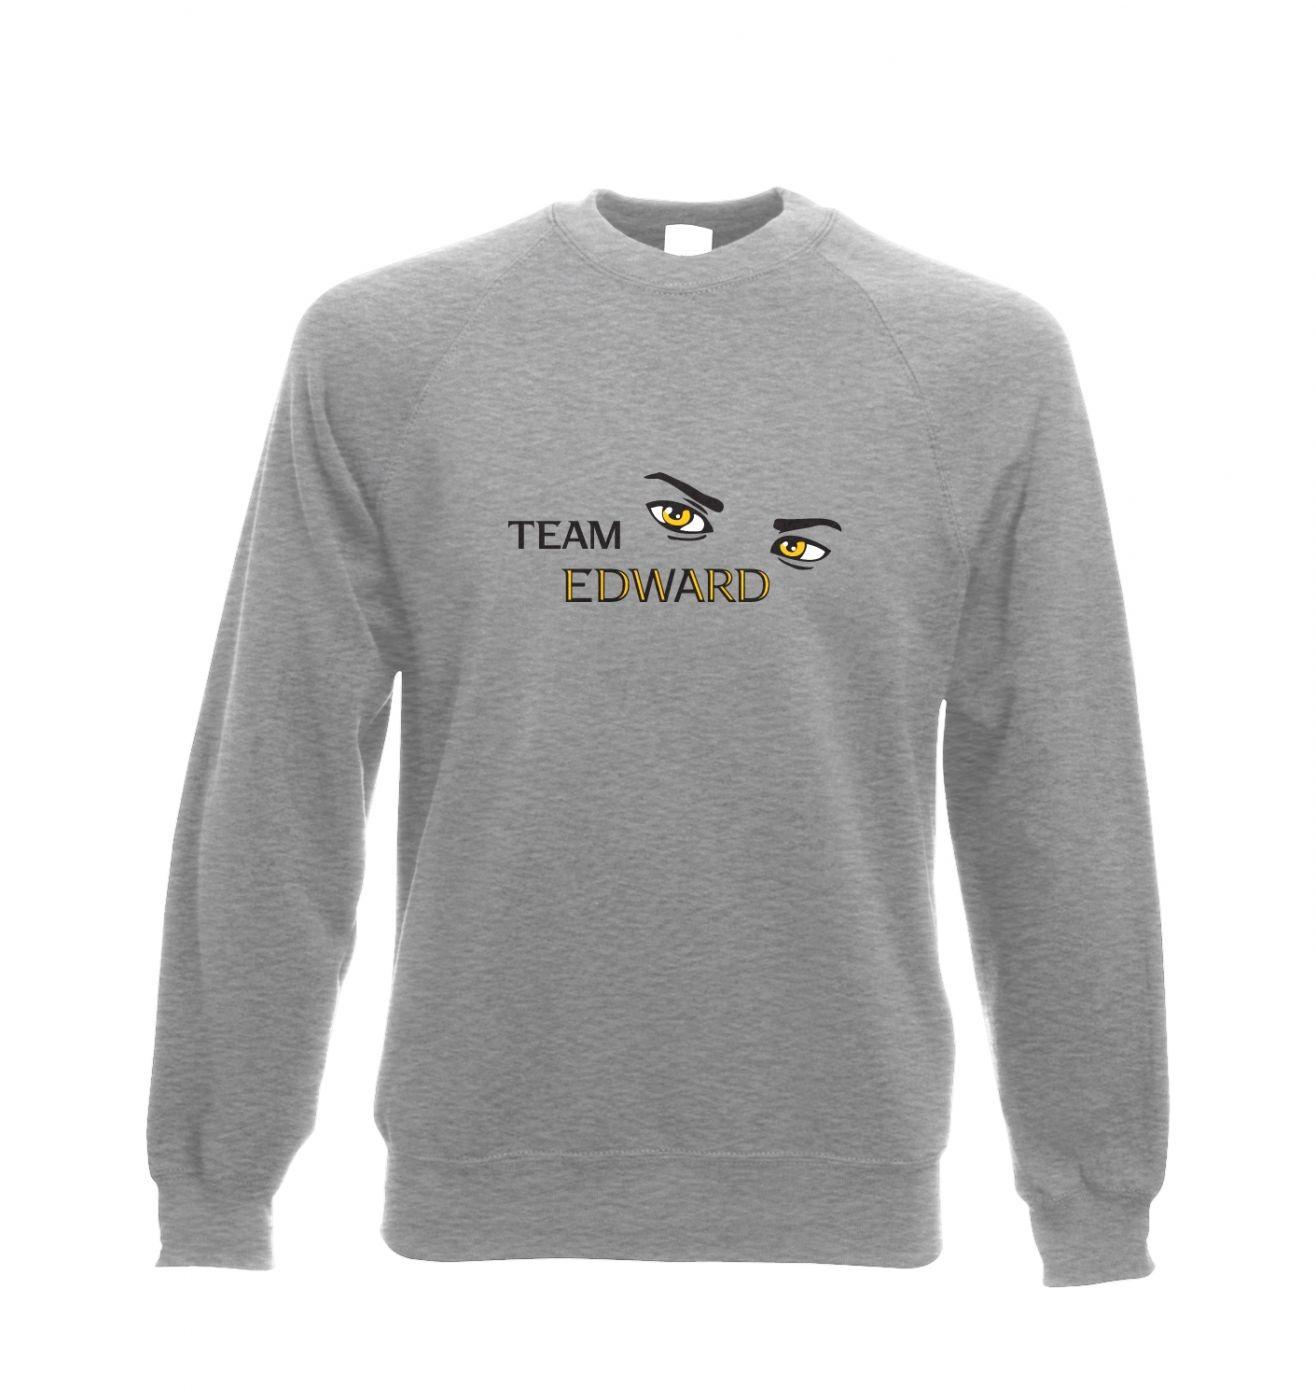 Team Edward Adult Crewneck Sweatshirt  - Inspired by Twilight